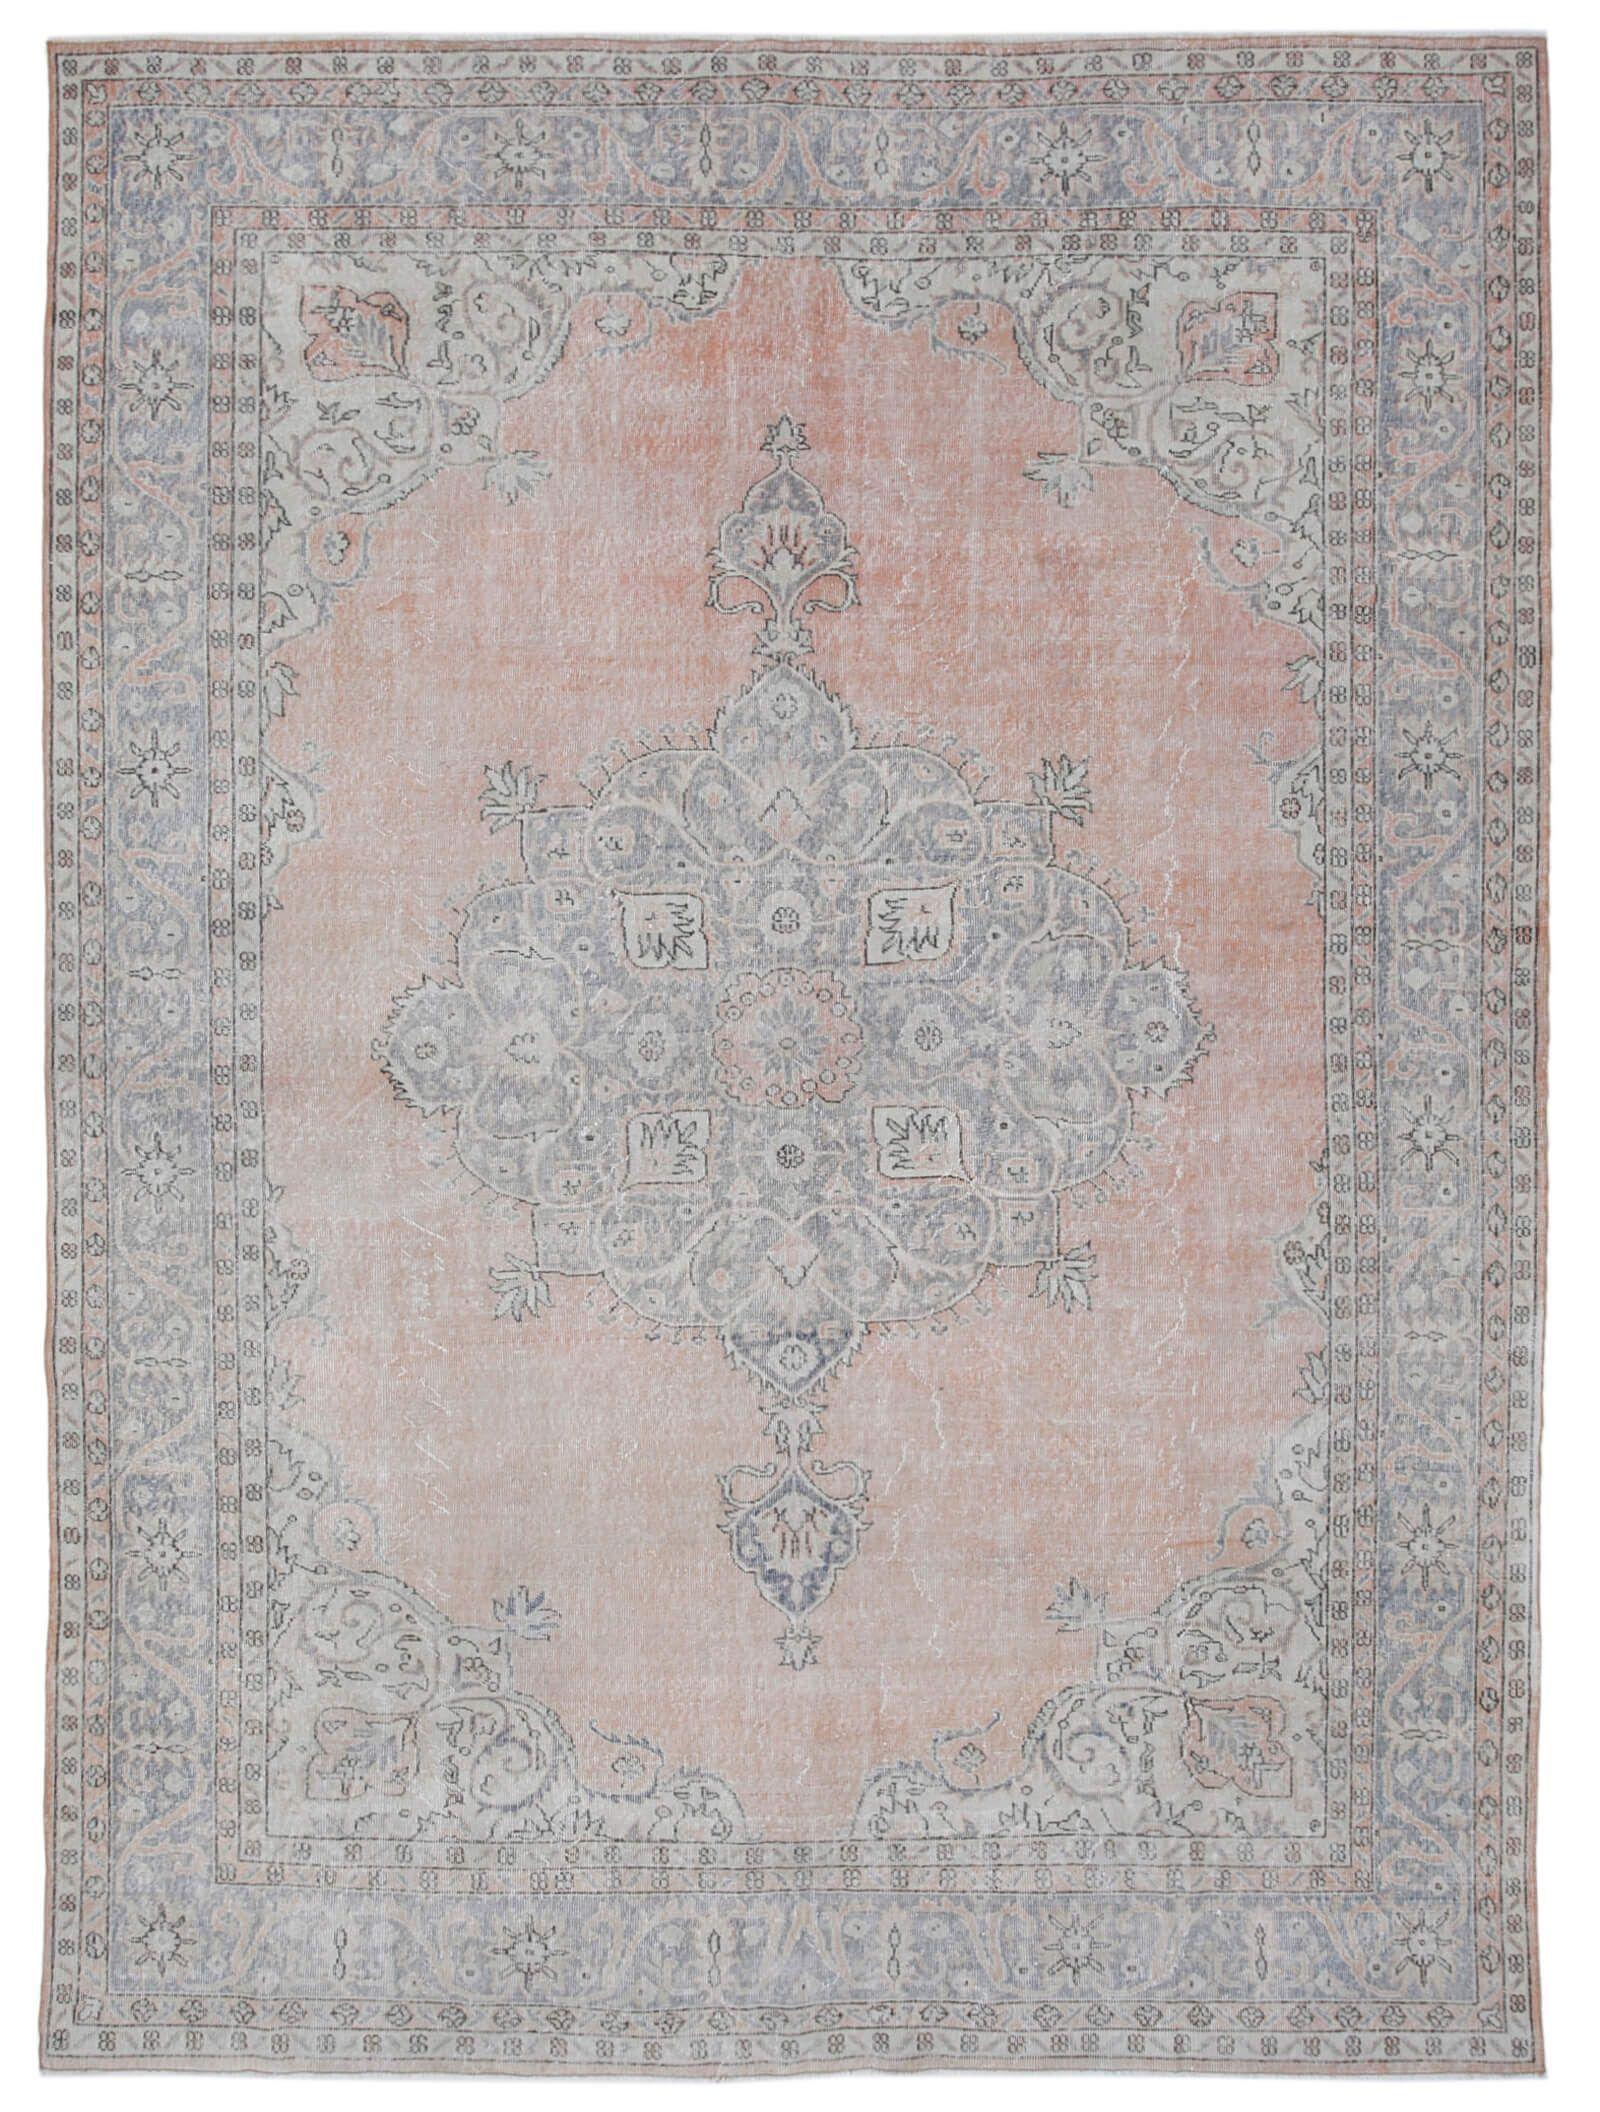 9x12 Beige Turkish Vintage Area Rug 11830 In 2020 Vintage Rugs Wool Area Rugs Vintage Area Rugs